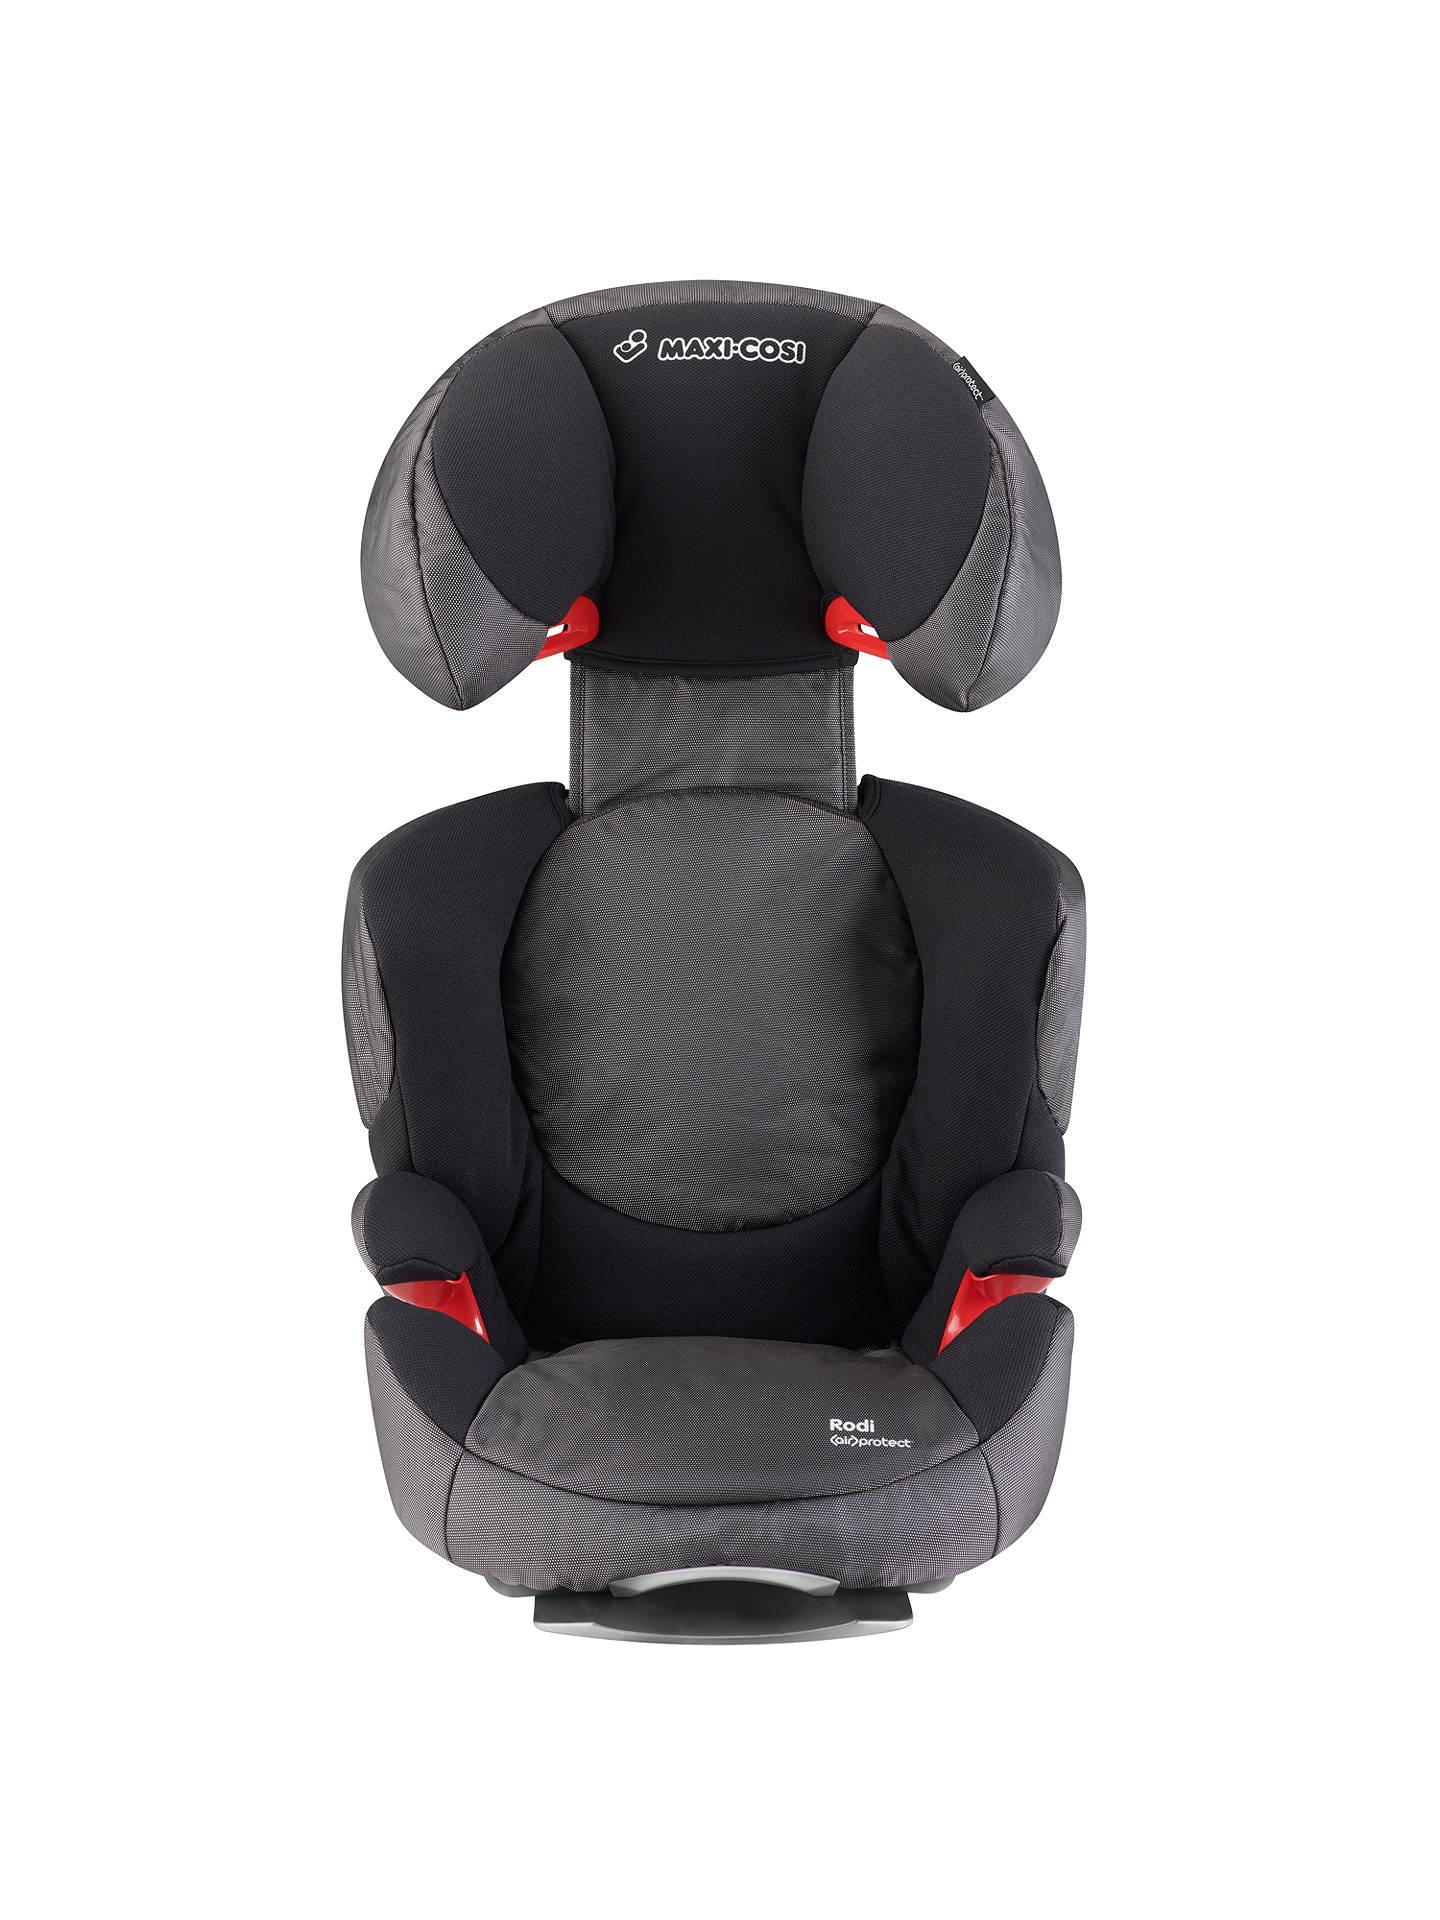 maxi cosi rodi air protect car seat black reflection at john lewis partners. Black Bedroom Furniture Sets. Home Design Ideas